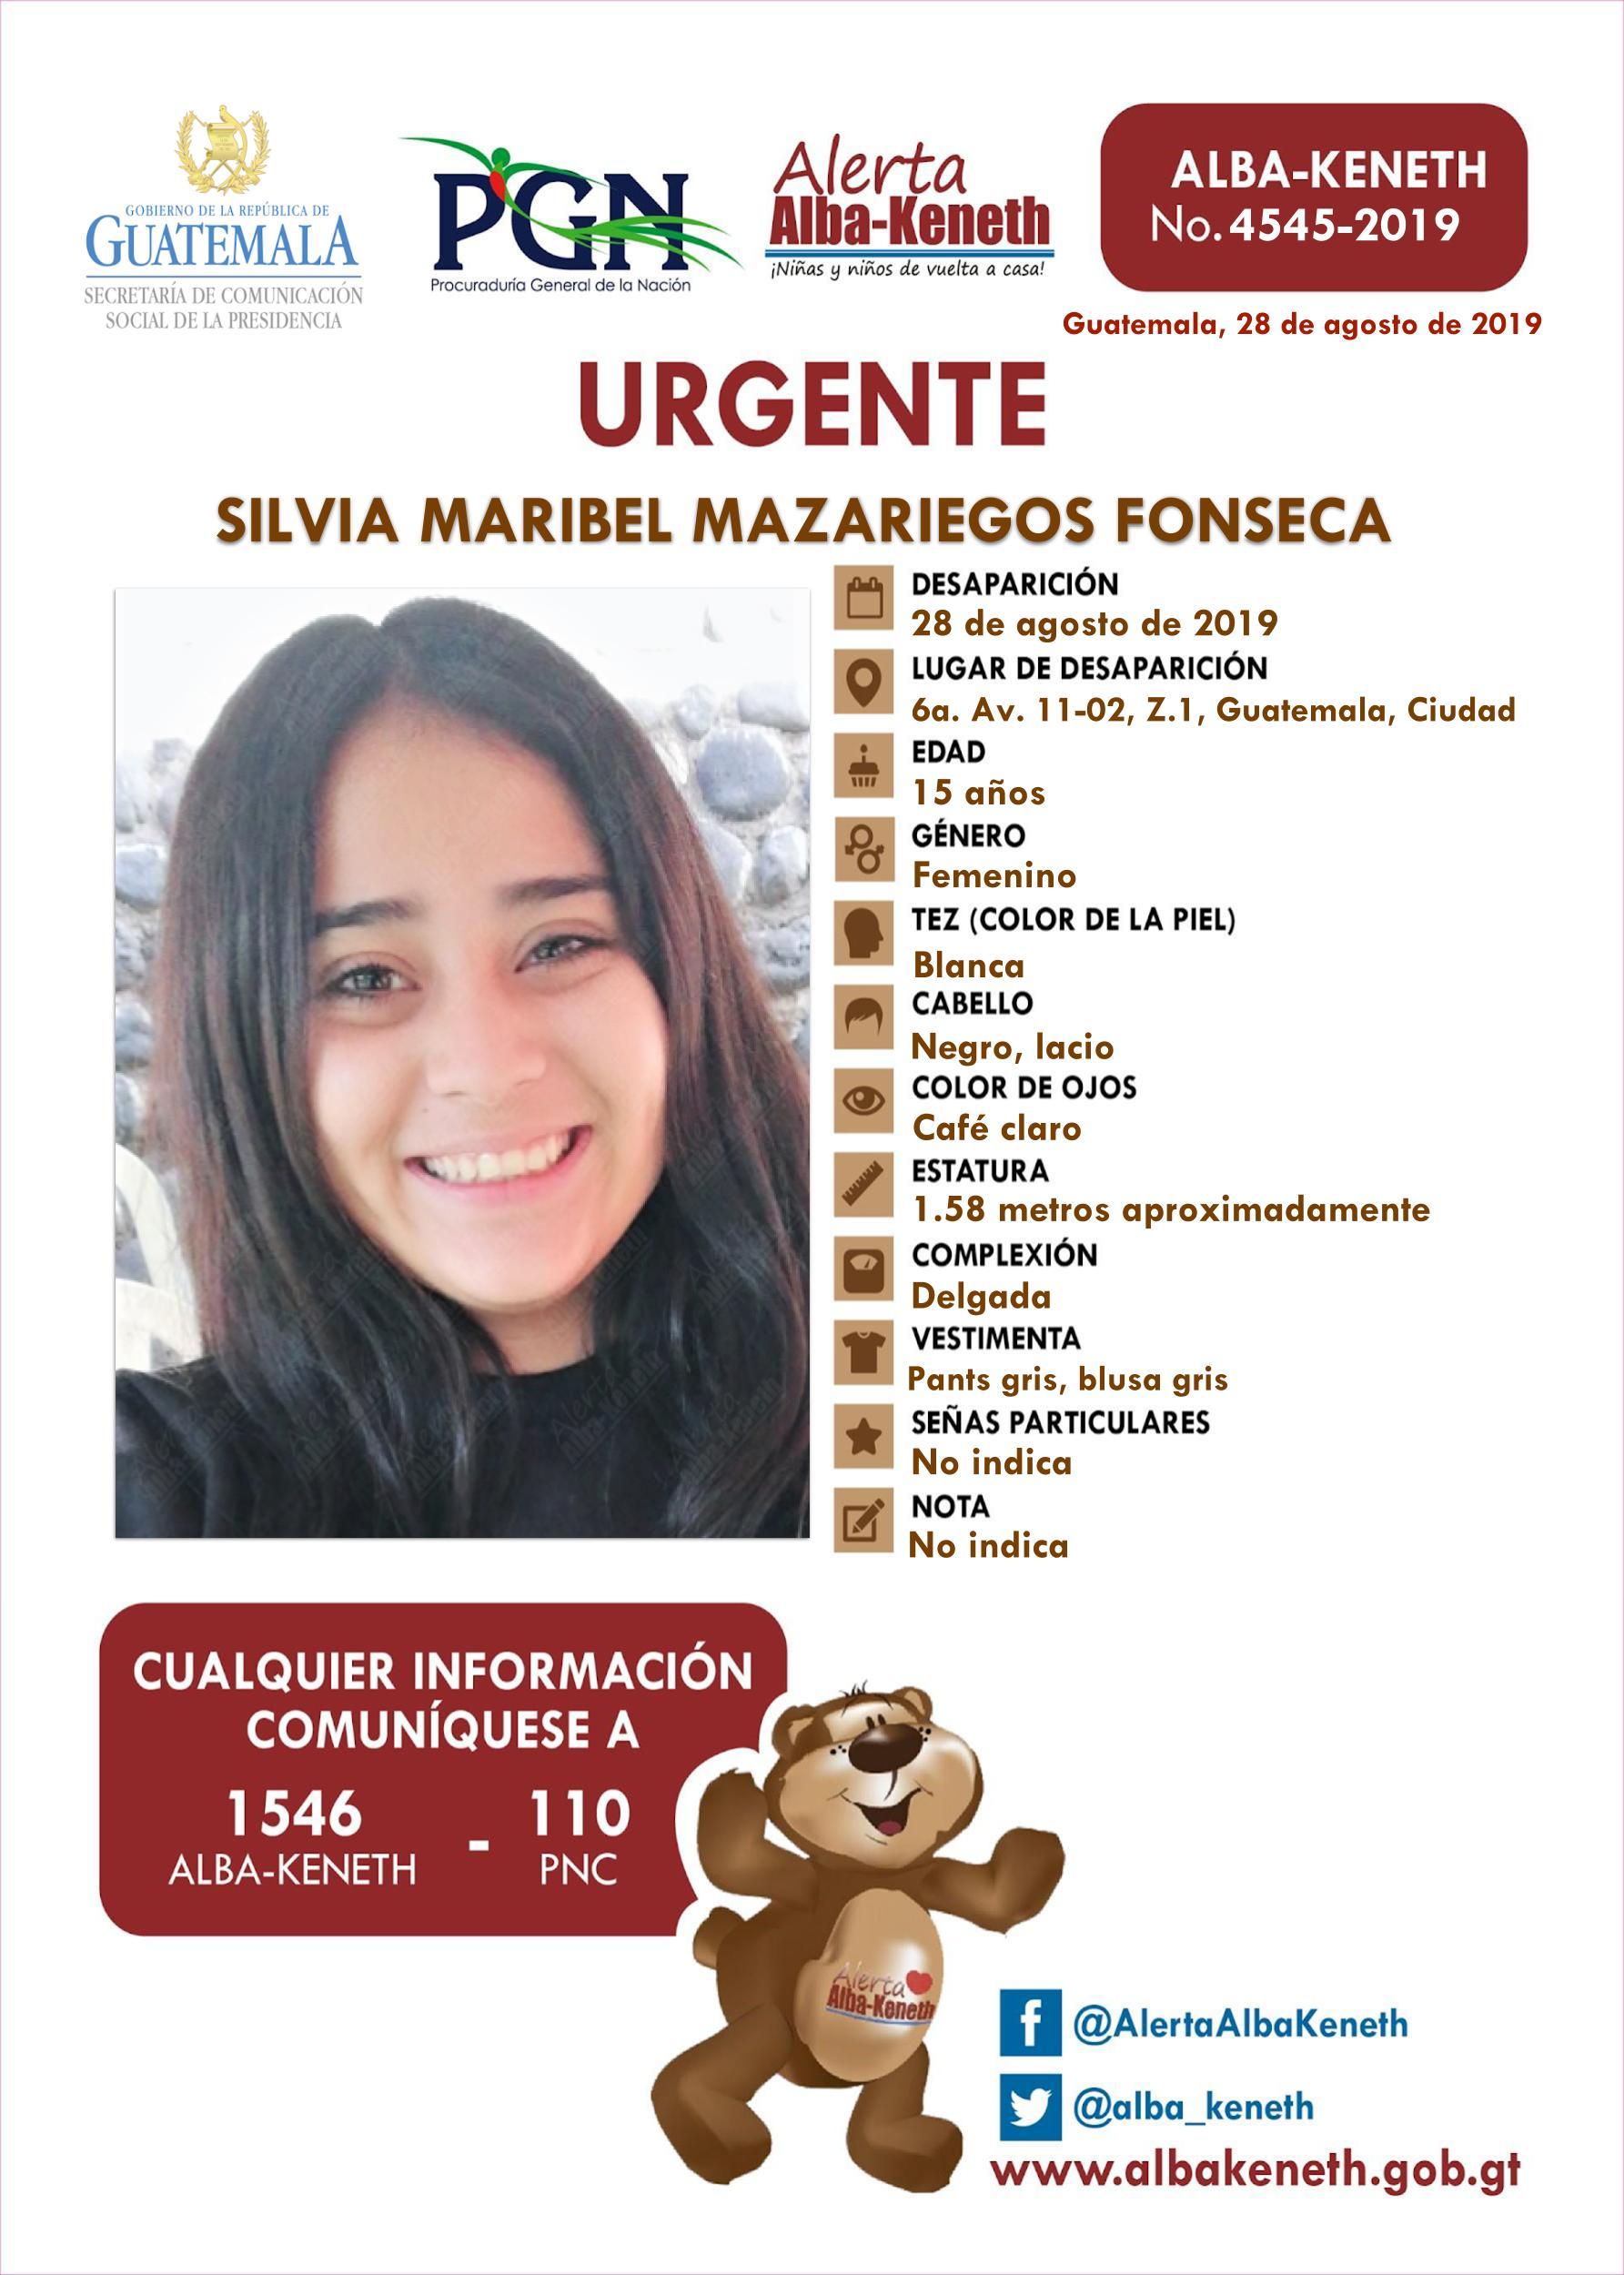 Silvia Maribel Mazariegos Fonseca